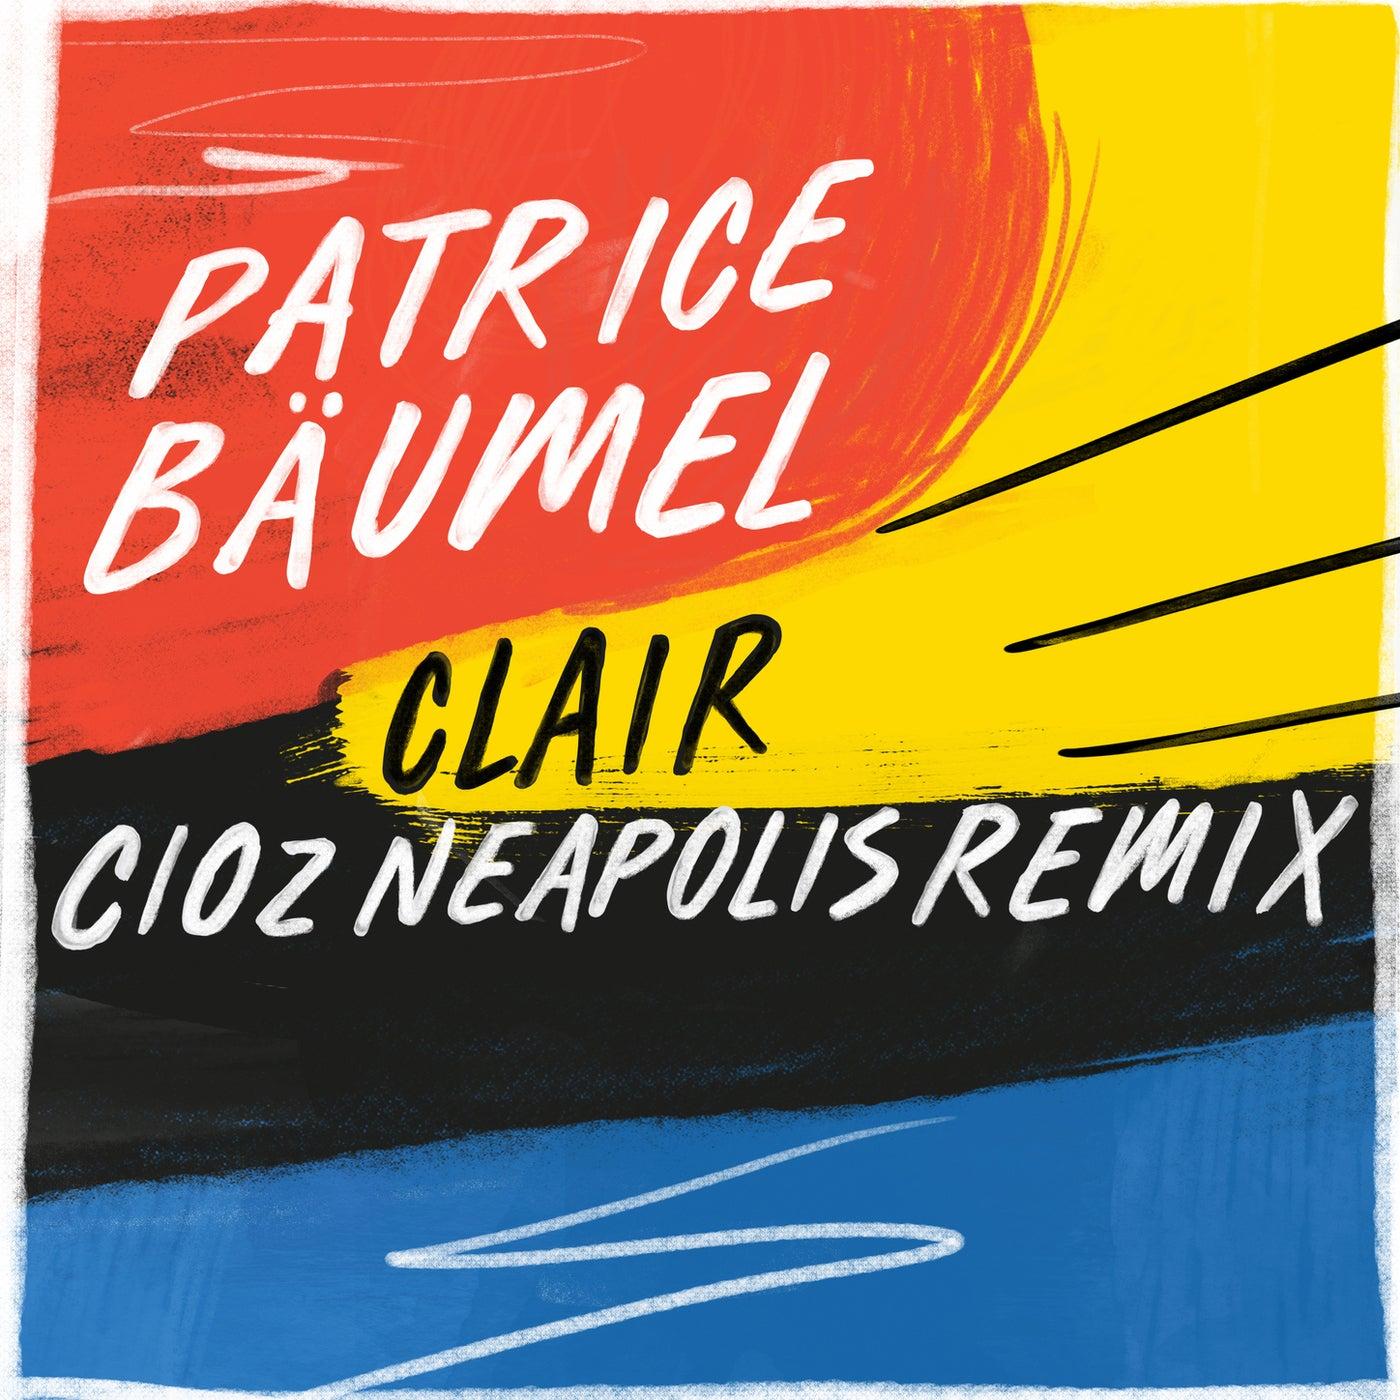 Clair (Cioz Neapolis Remix)